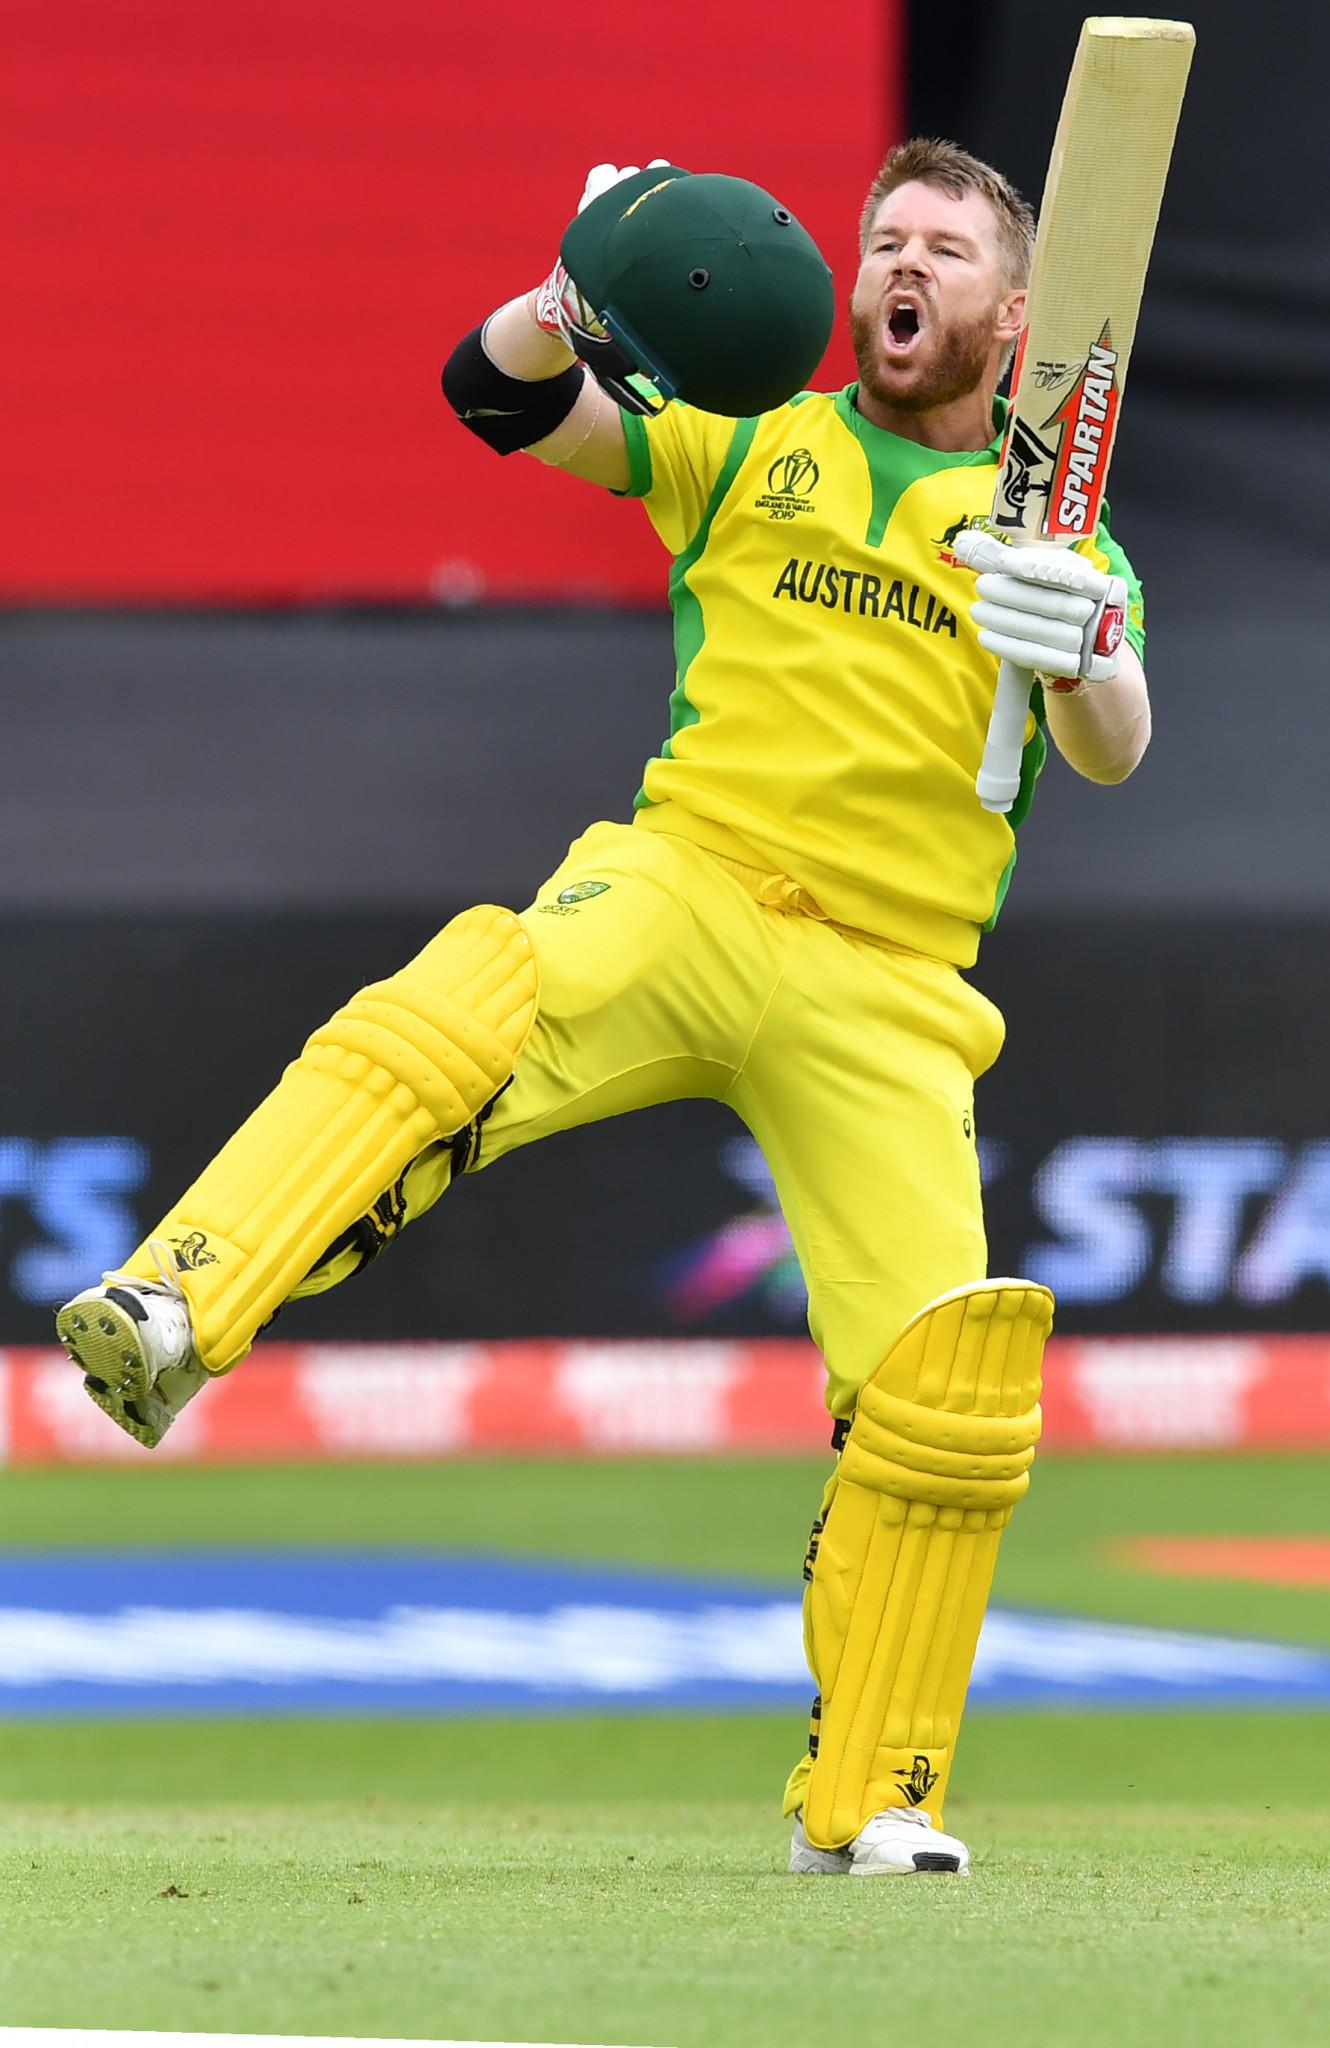 Australia beat Pakistan as ICC Cricket World Cup returns after rain